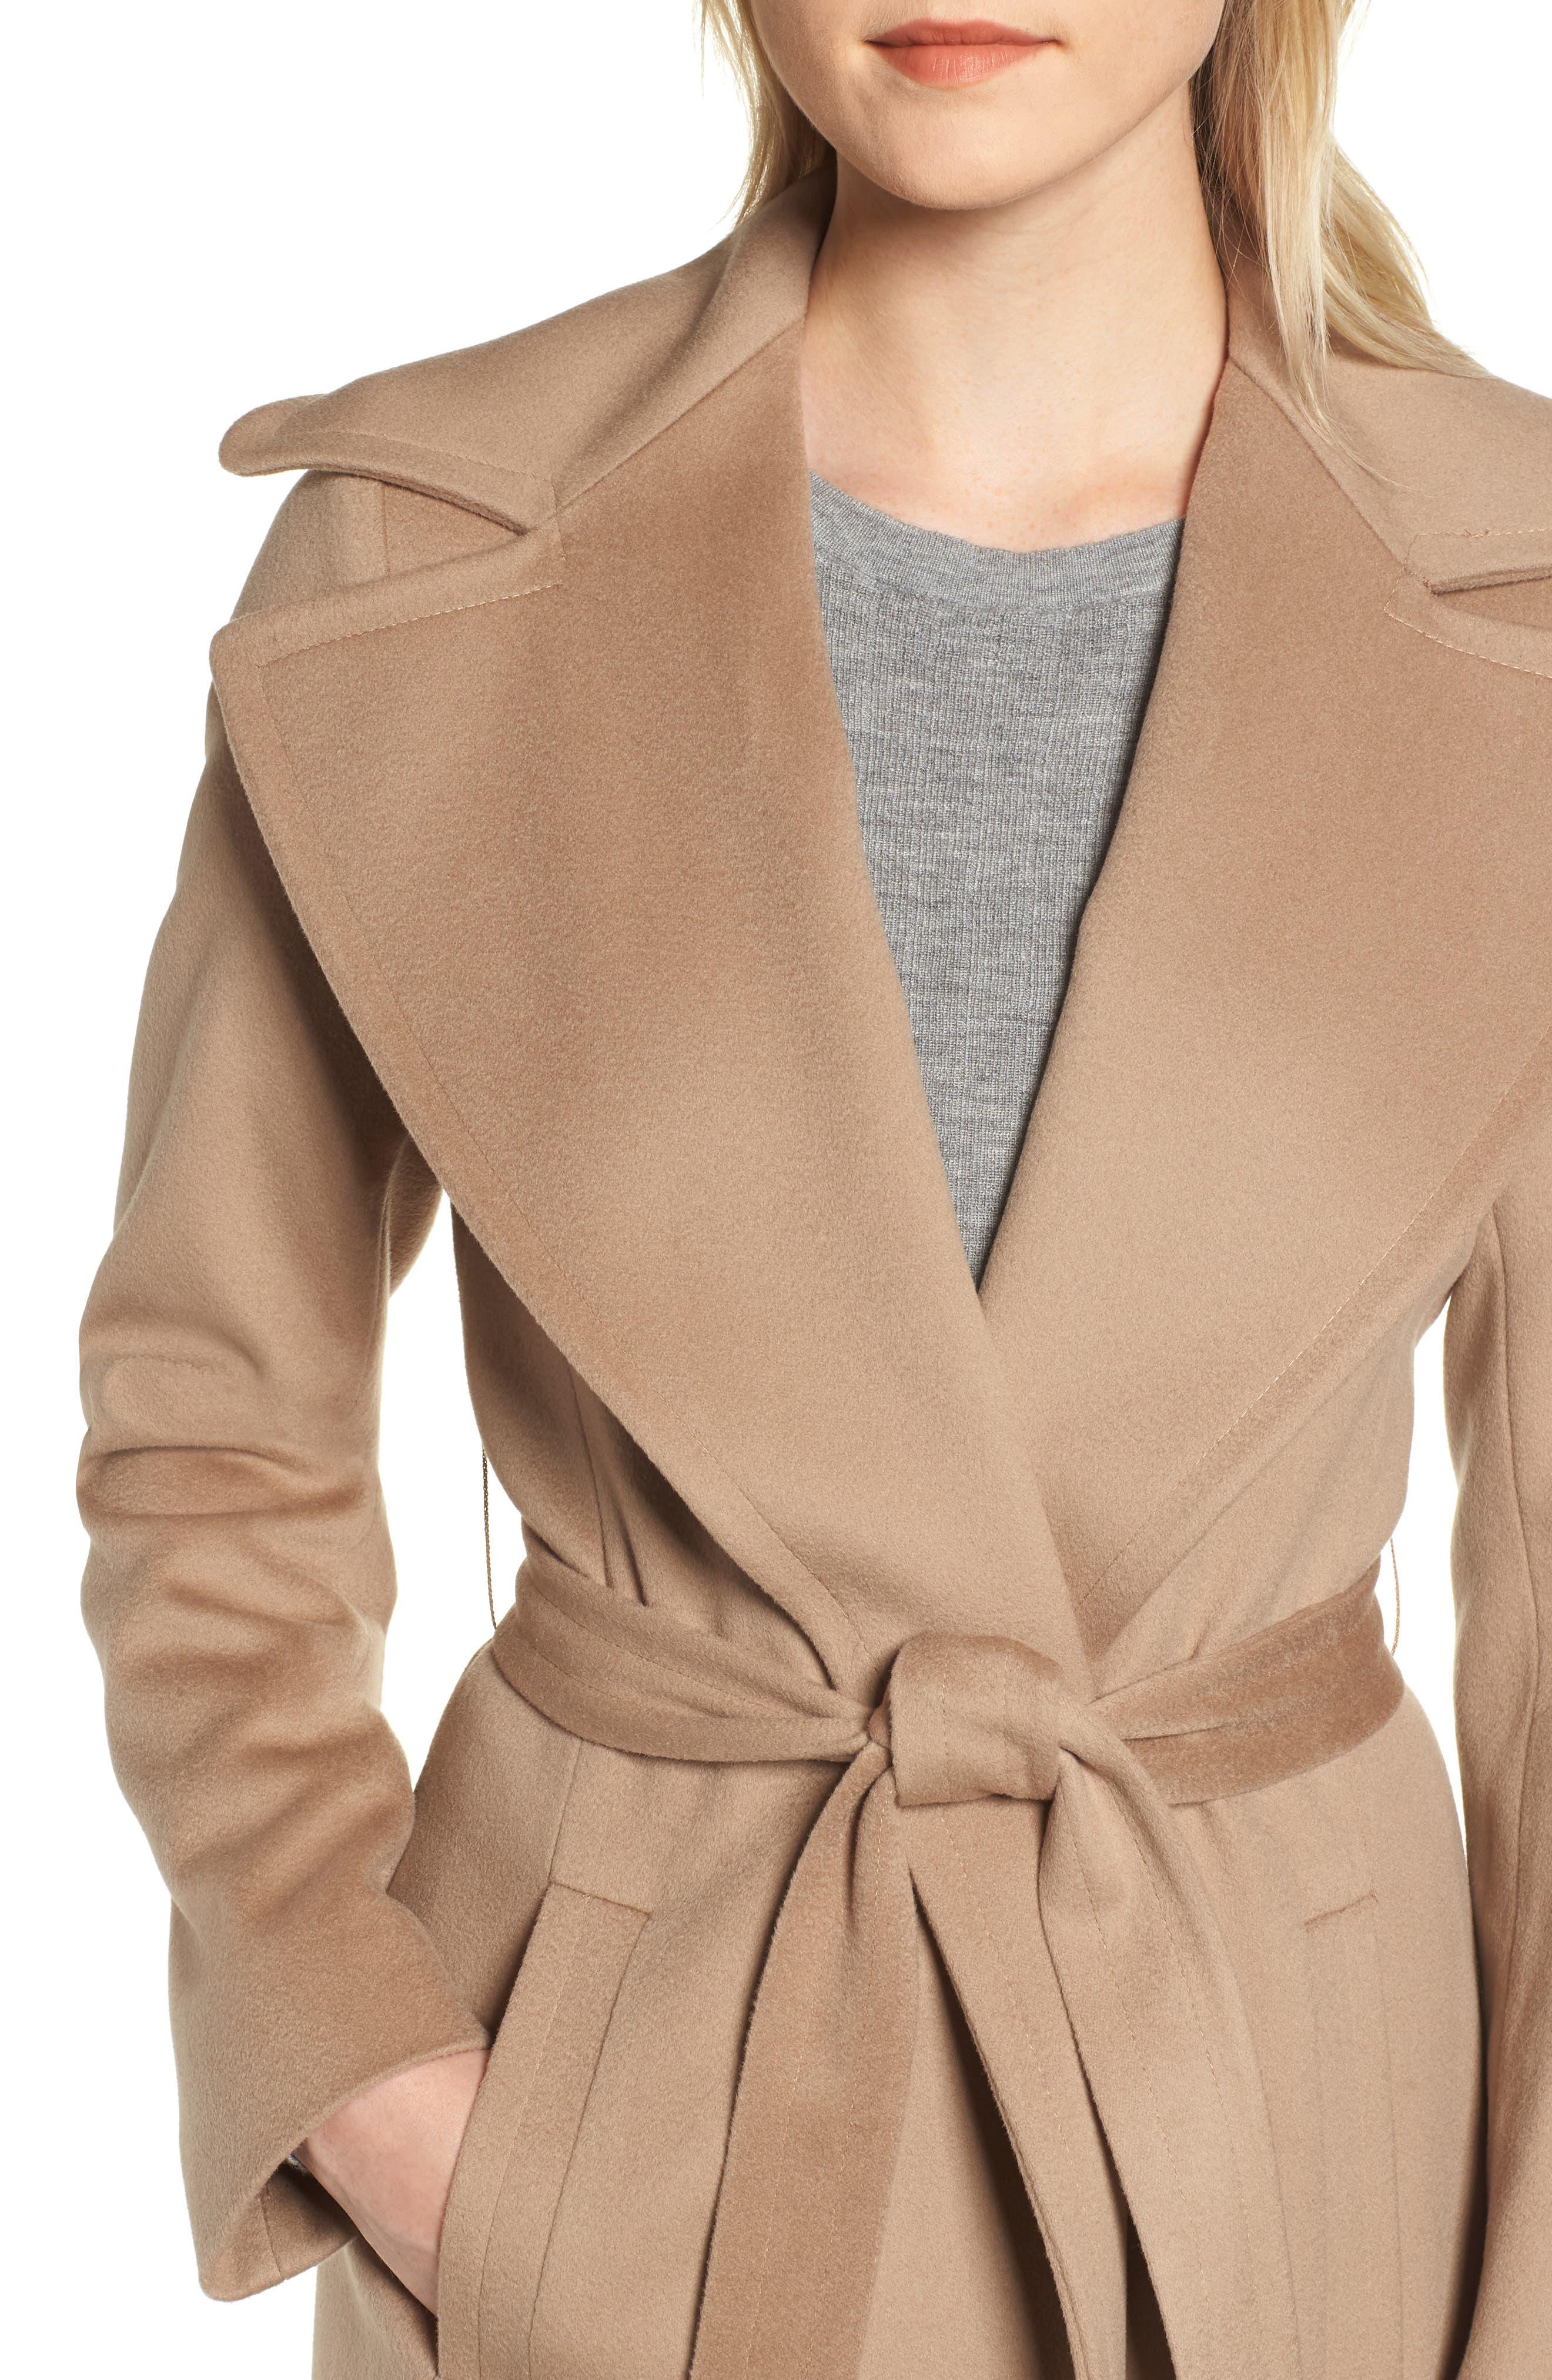 FLEURETTE,                             Loro Piana Wool Wrap Coat,                             Alternate thumbnail 5, color,                             CAMEL